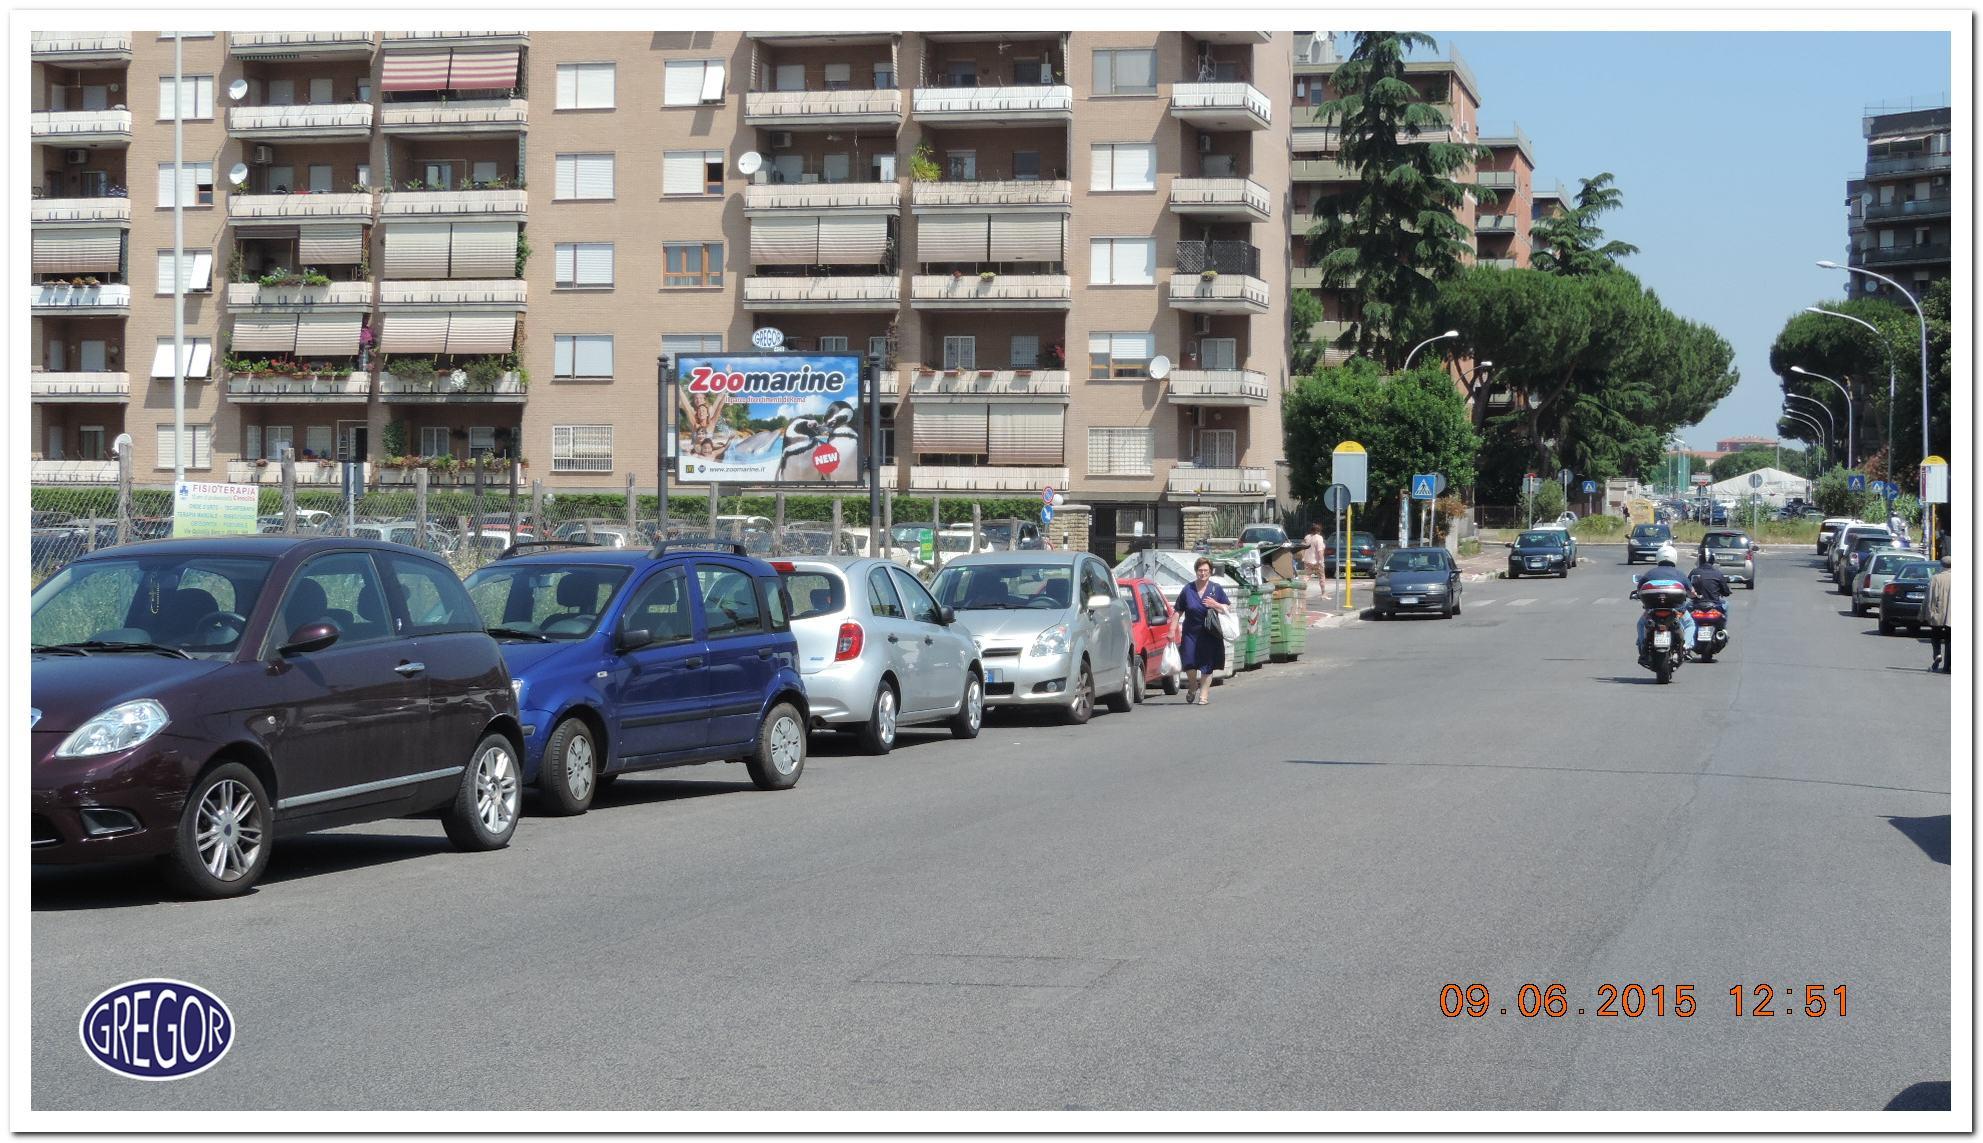 Via Stefano Oberto C.459